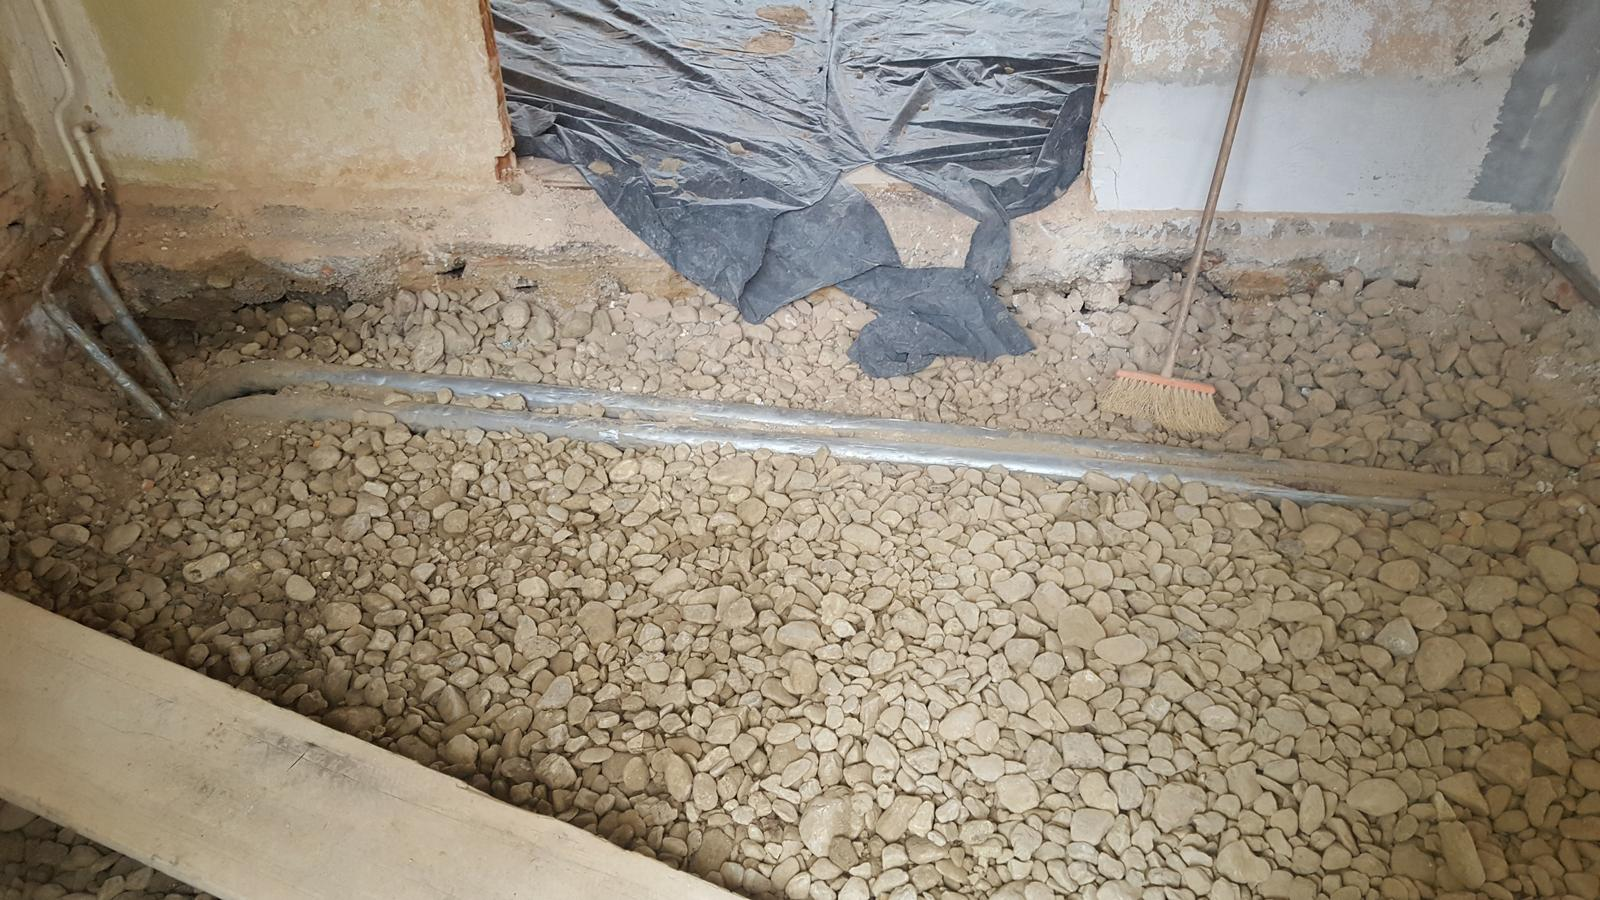 Prerabka domu v historickom centre - kurenie ide nanovo takze vykop von a pripravit pre kurenarov